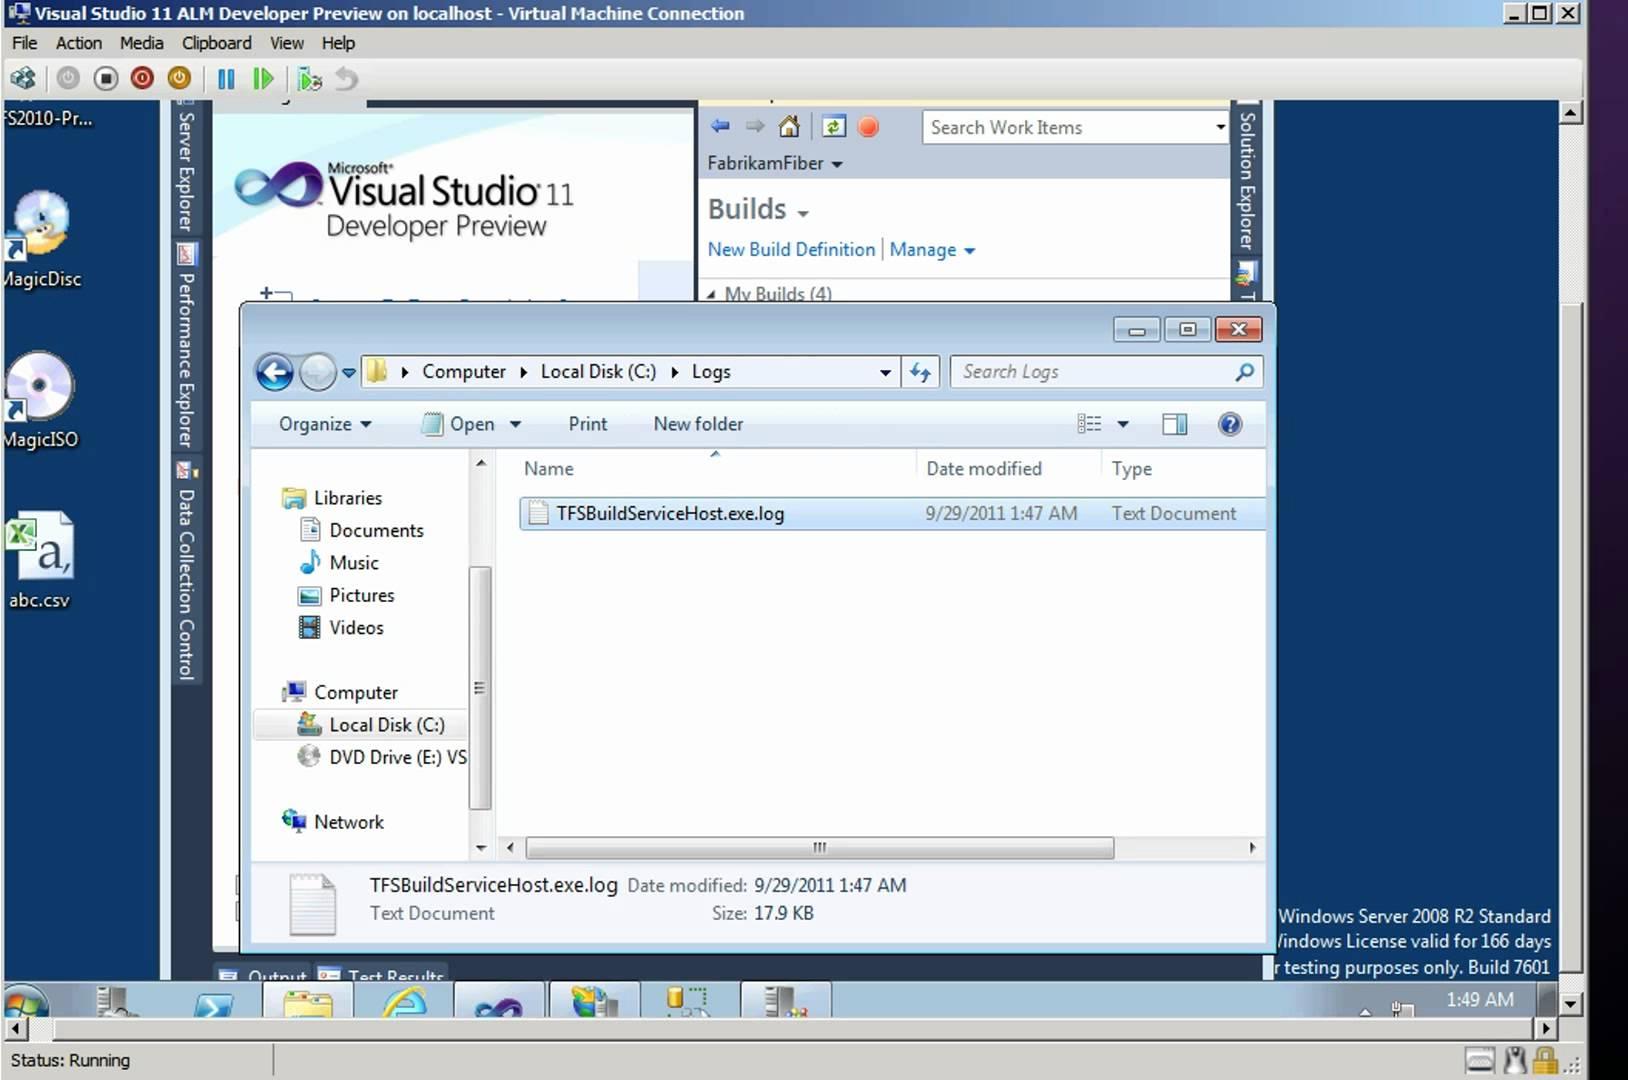 How to Troubleshoot Build Server Failure Visual Studio 2010